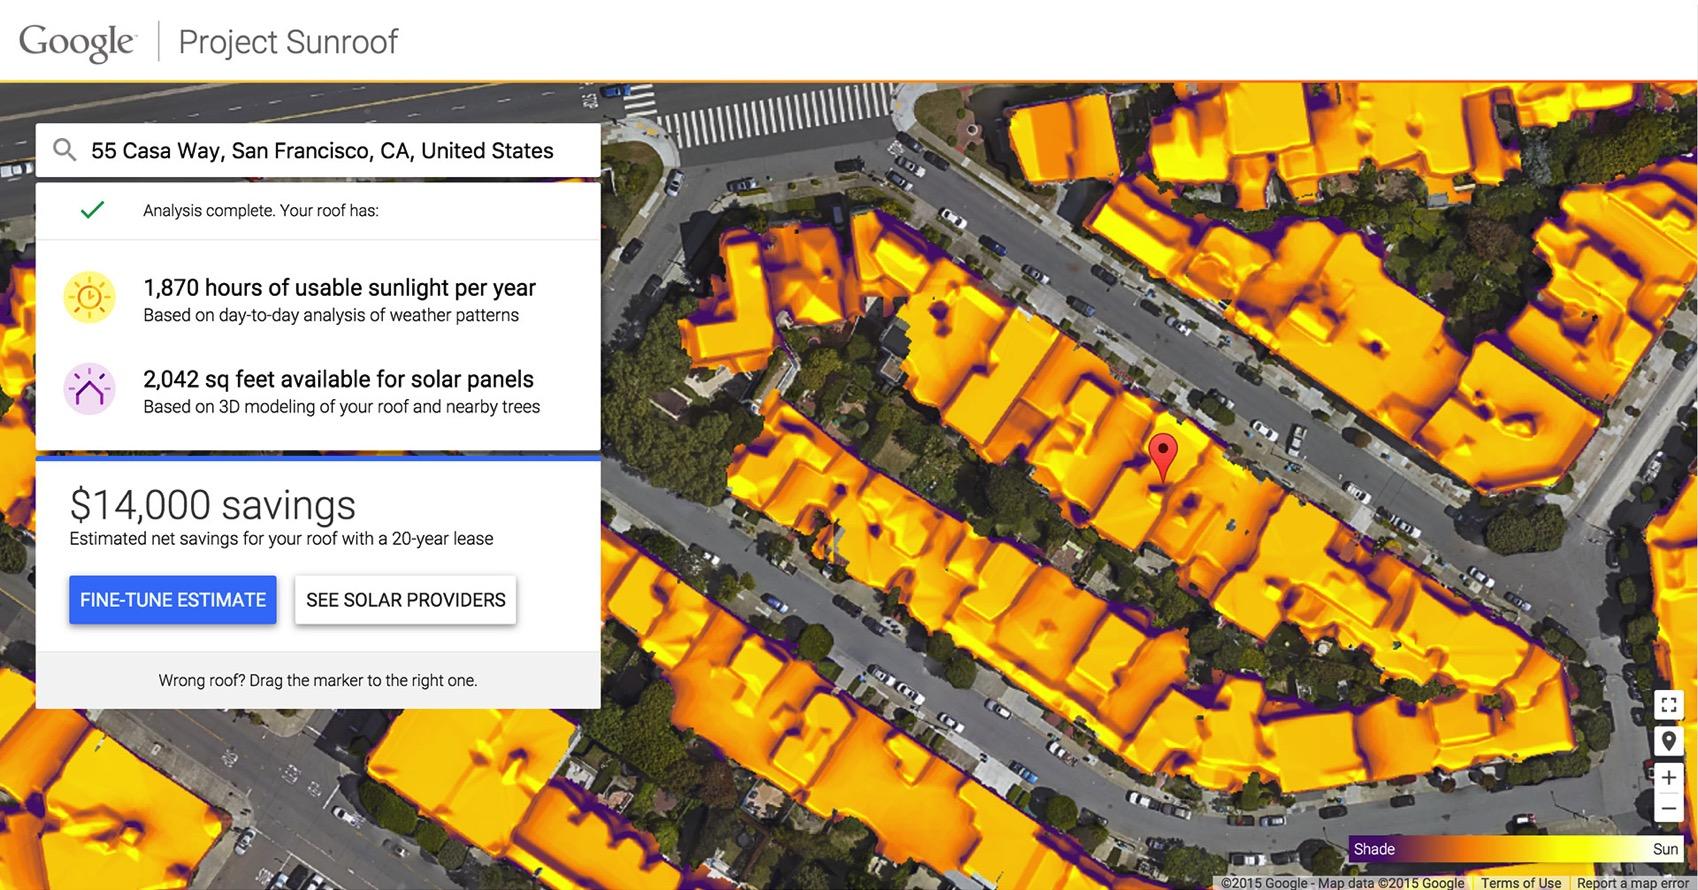 Googles Project Sunroof